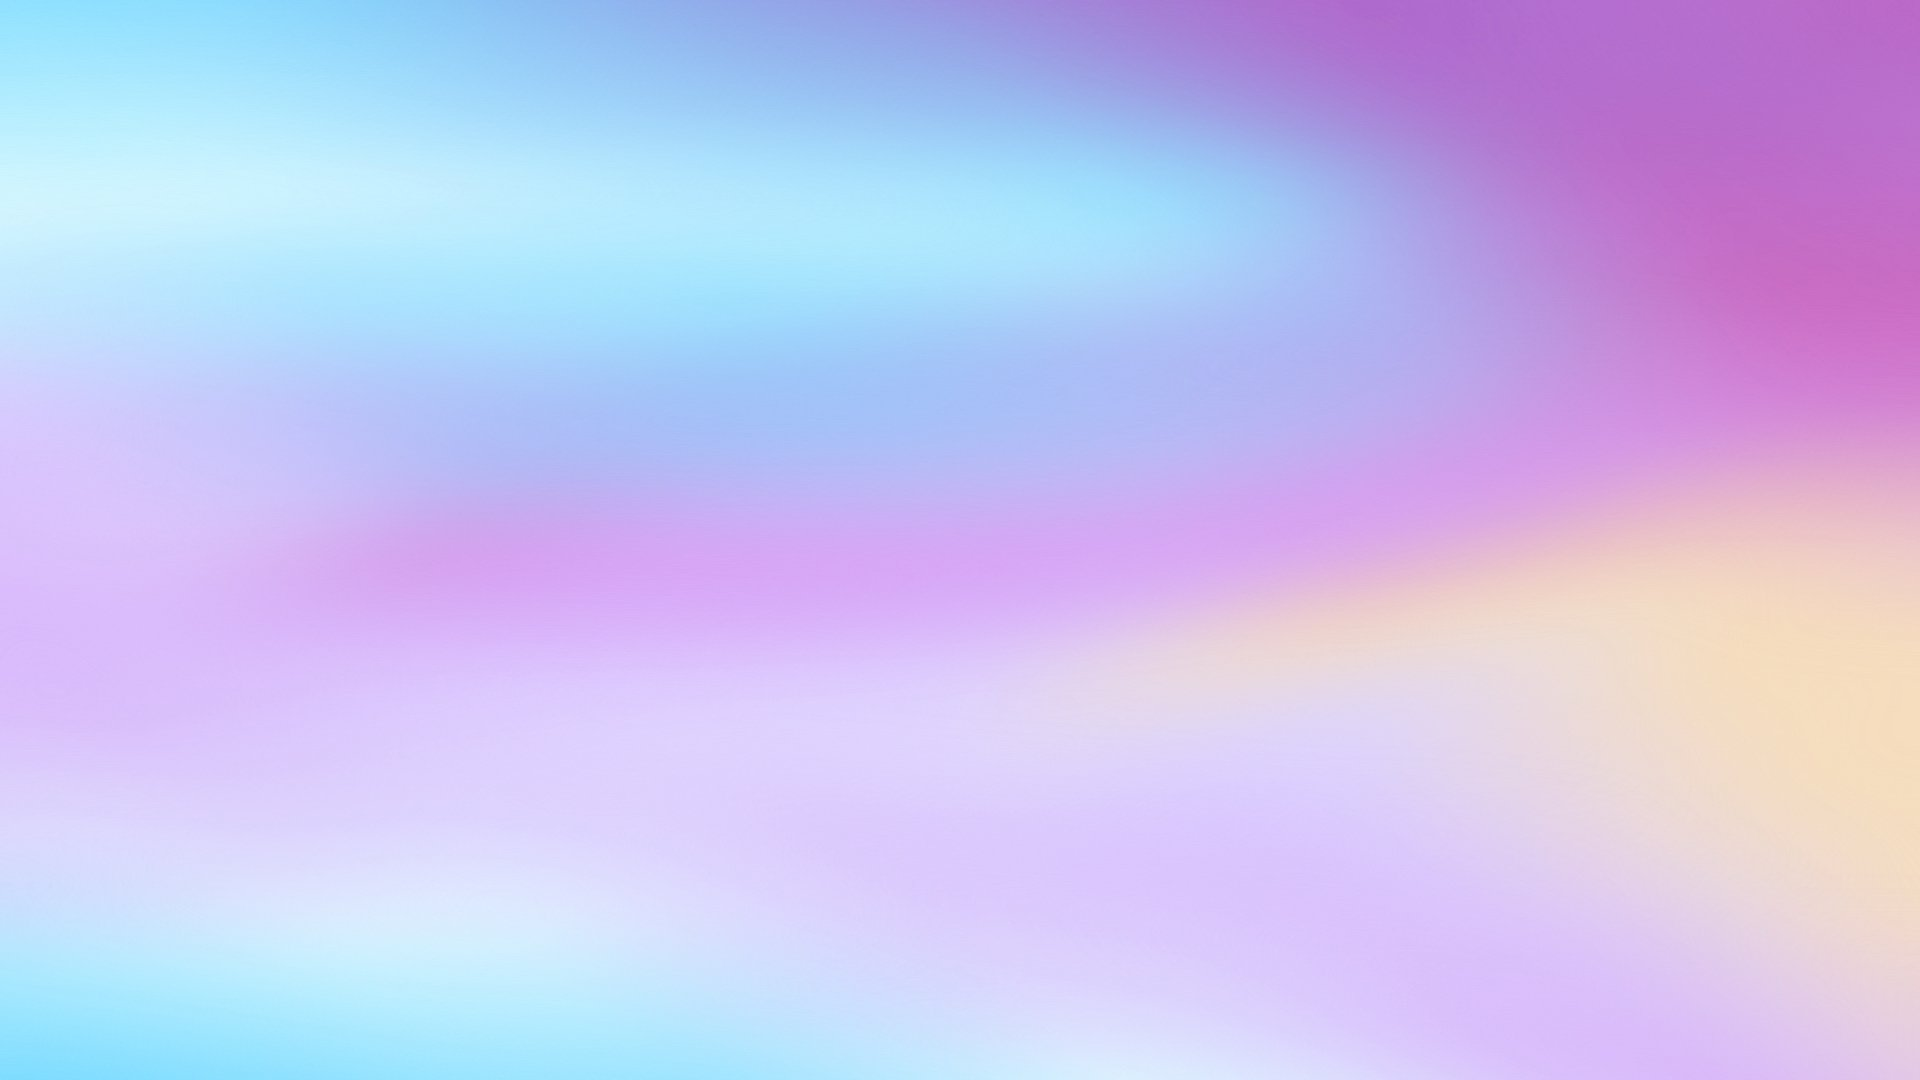 Colorful Tumblr Themes - 0425